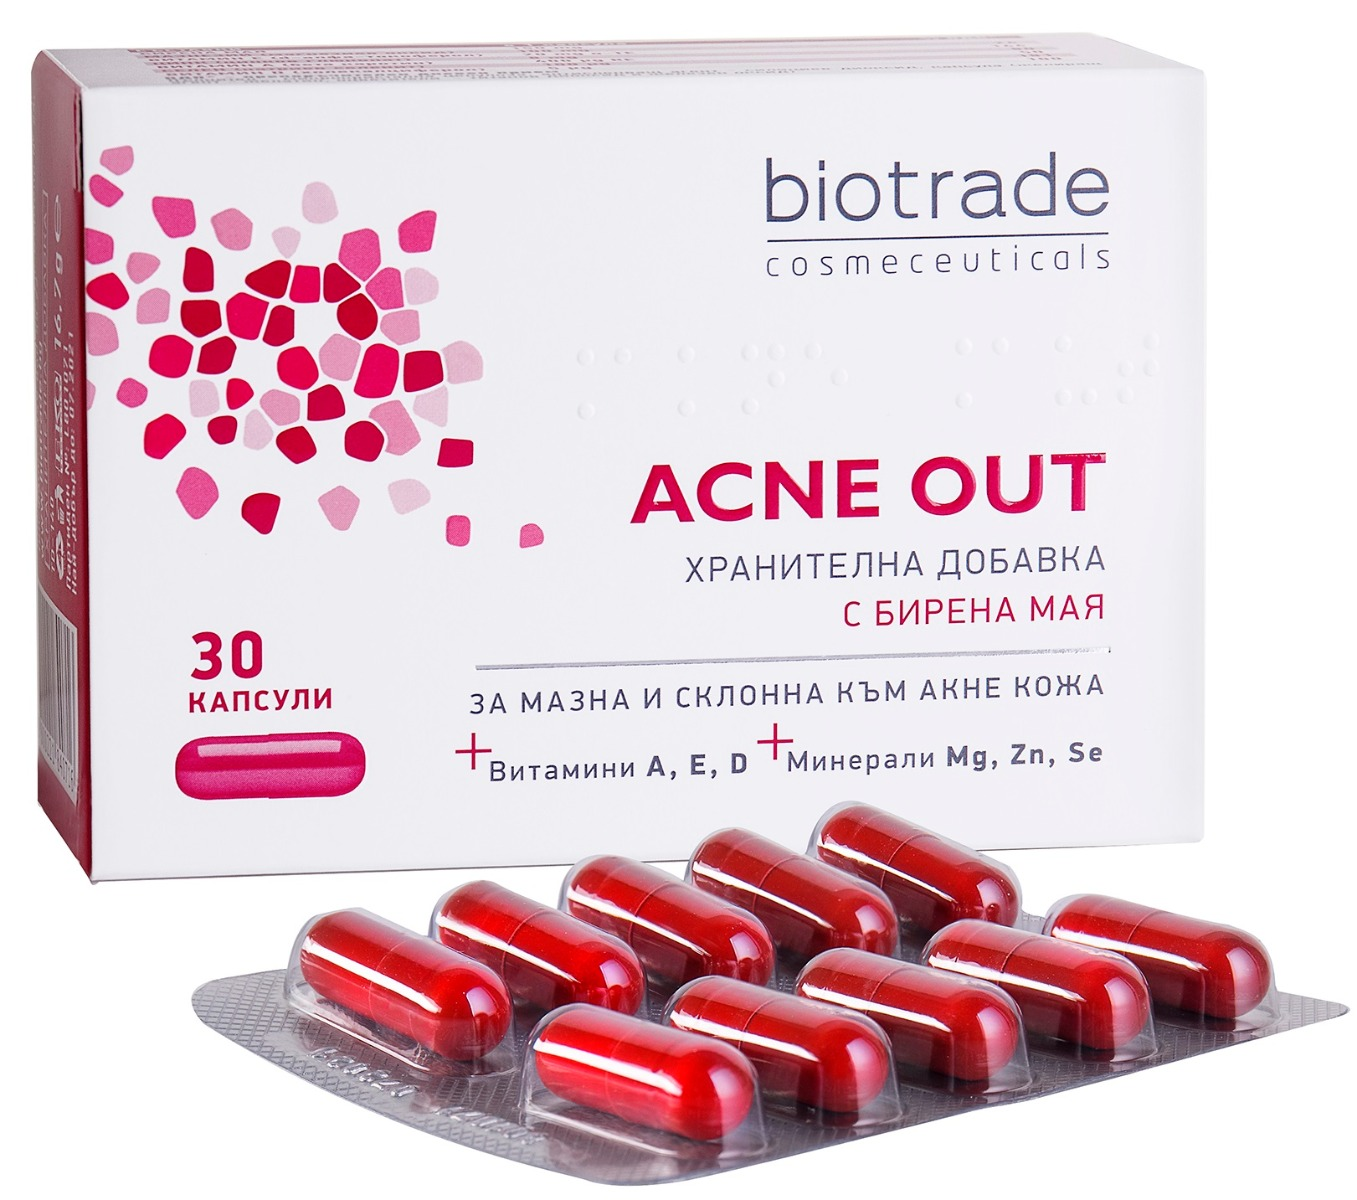 Acne Out, 30 capsule, Biotrade drmax.ro